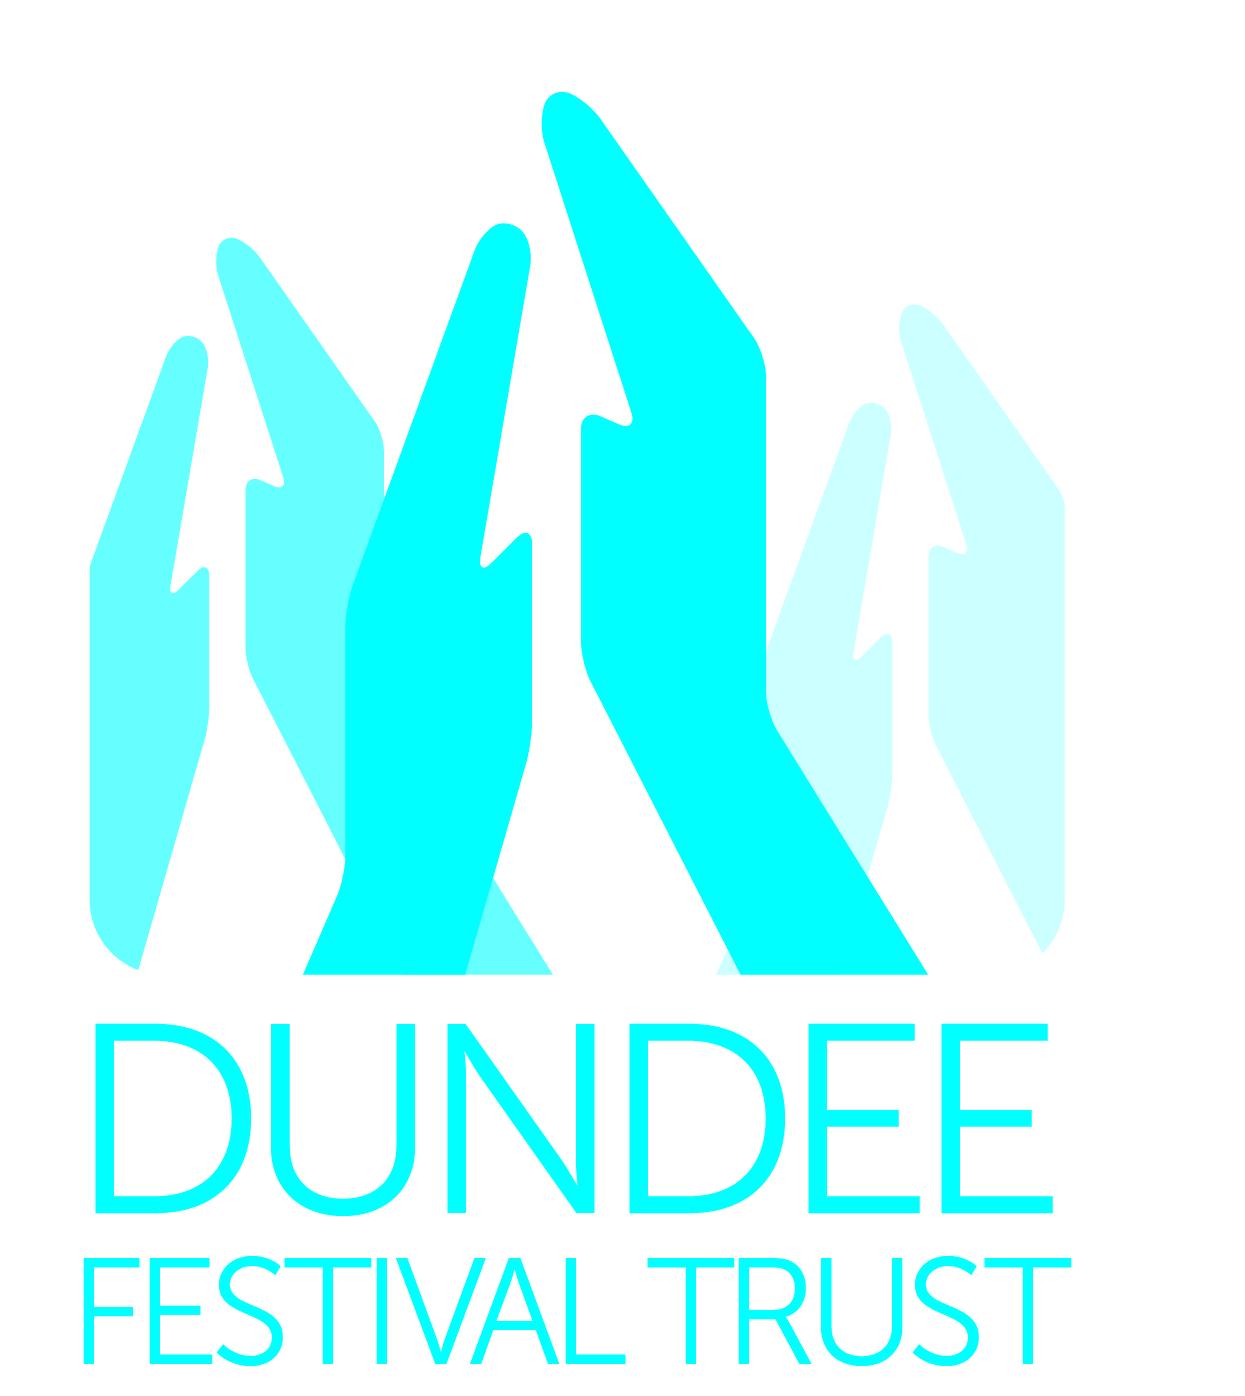 Dundee Festival Trust